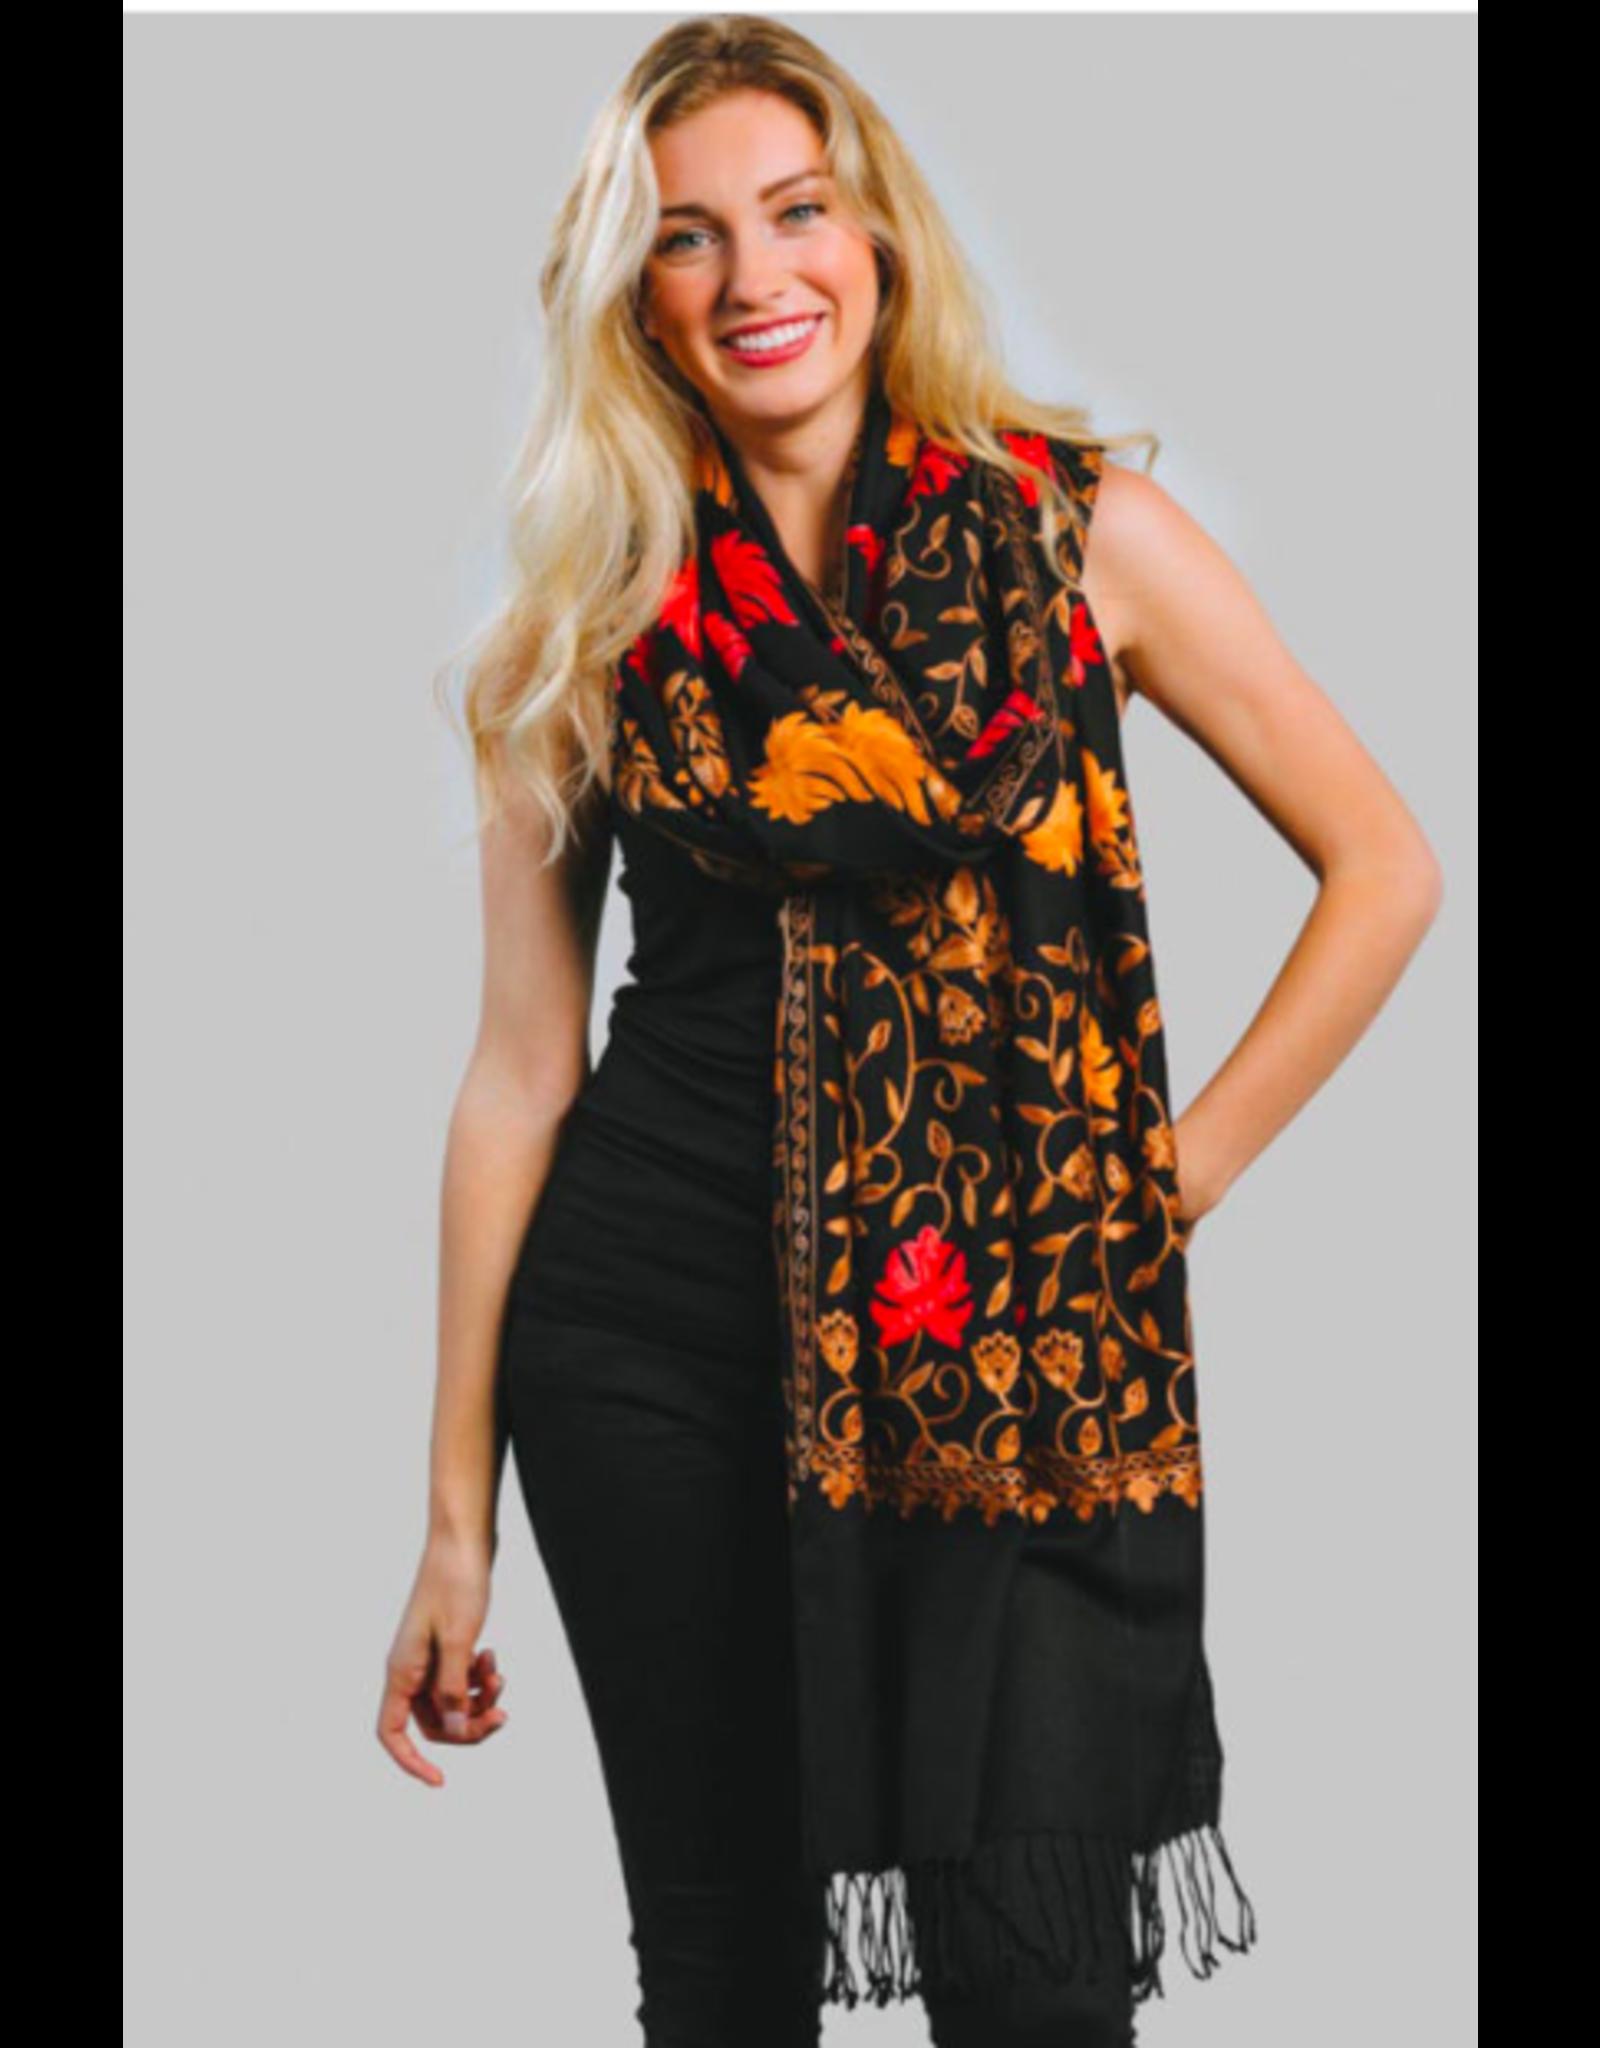 Janavi Embroidered Wool Shawl, Black & Autumn Shades, India